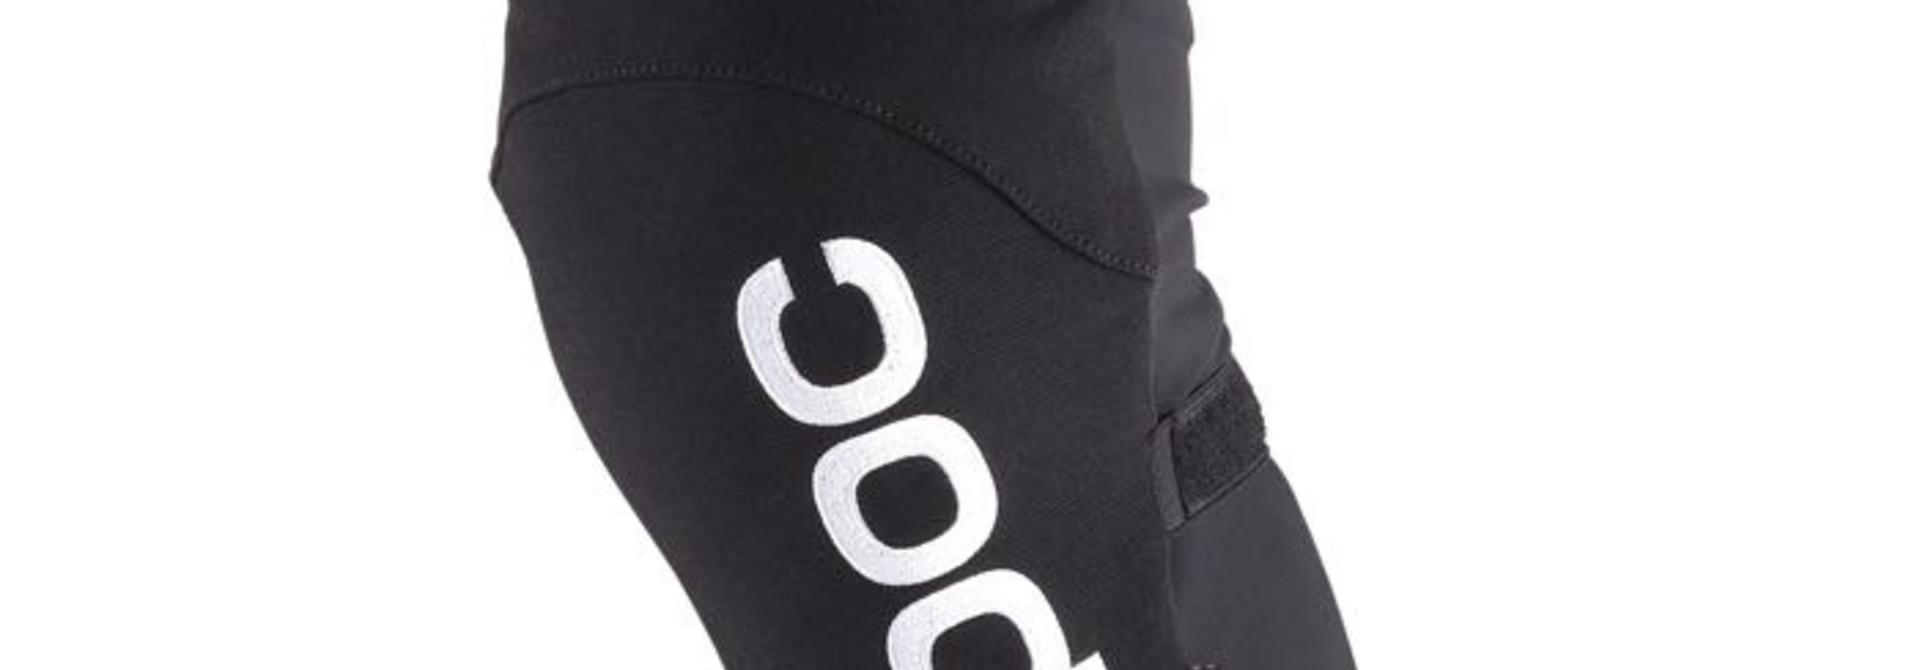 POC Joint VPD 2.0 Knee - Size M - Black